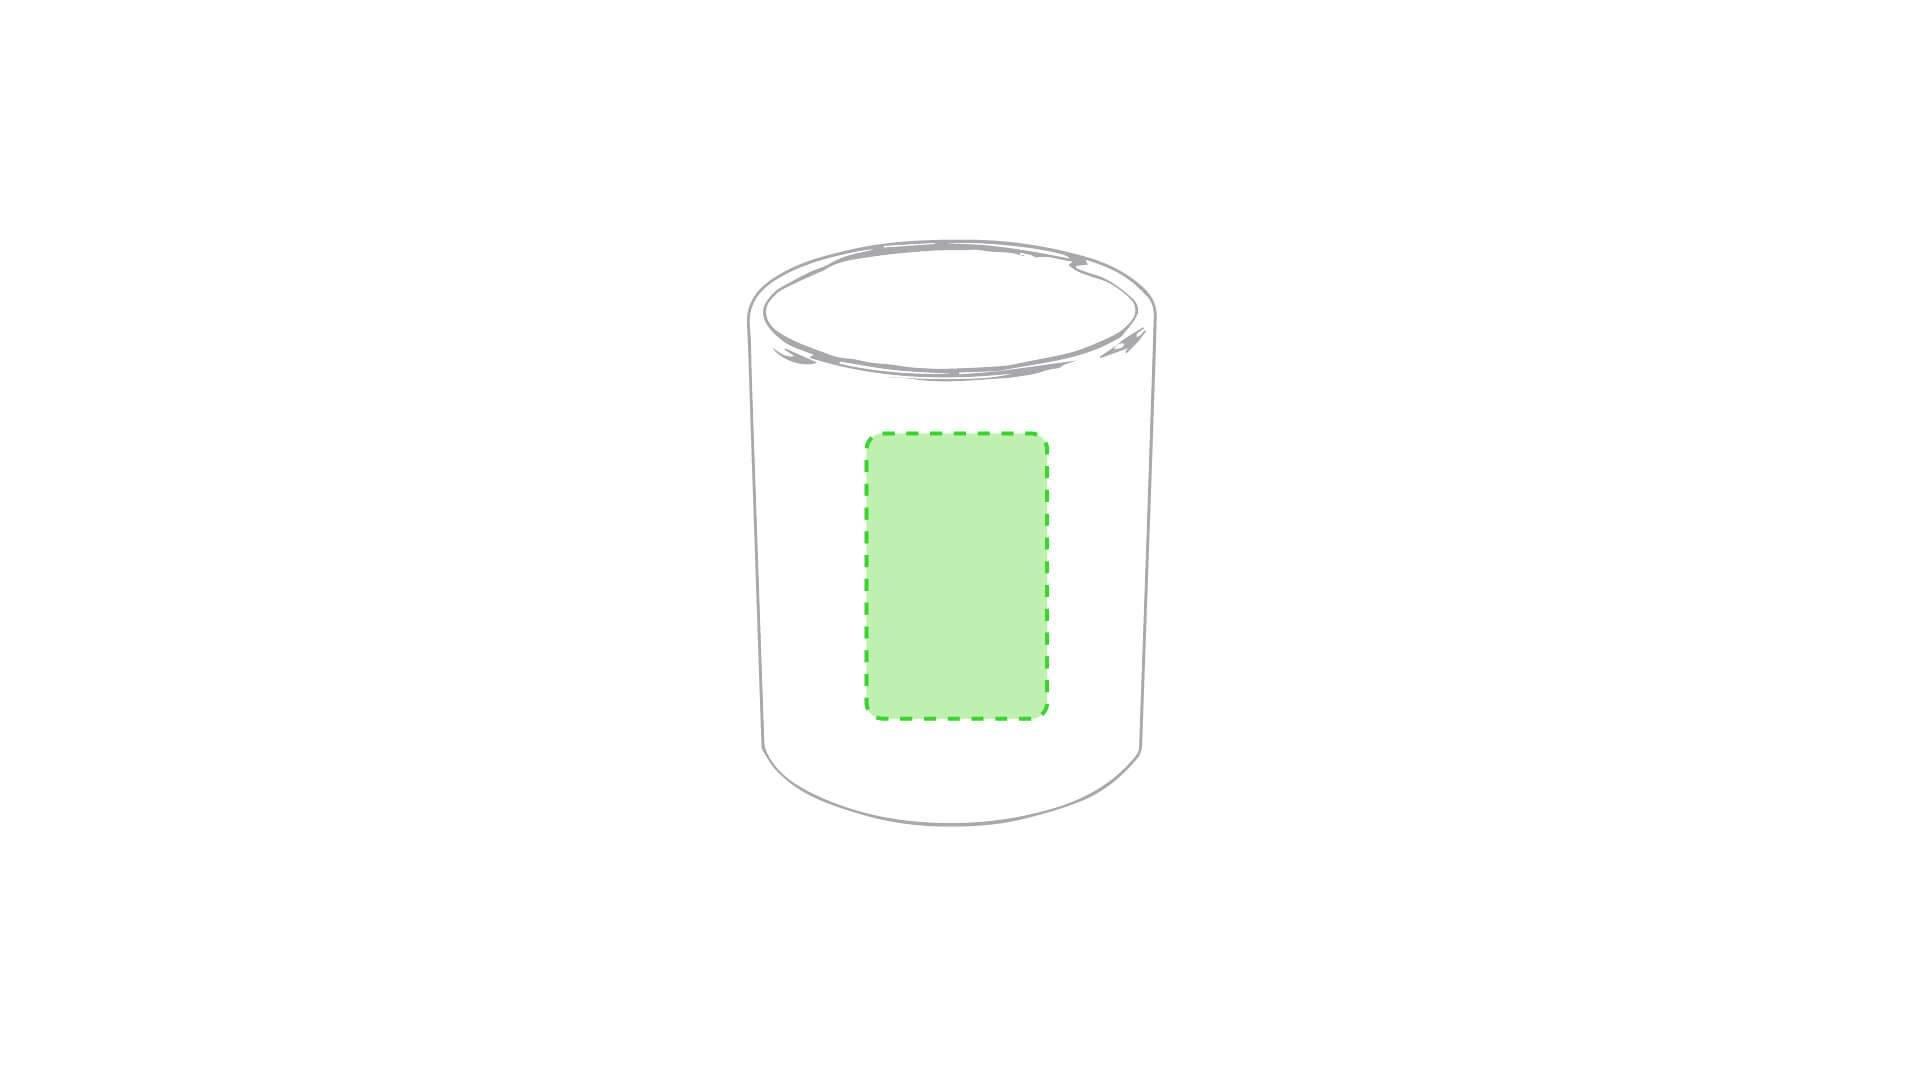 Taza cerámica blanca para engraving 2